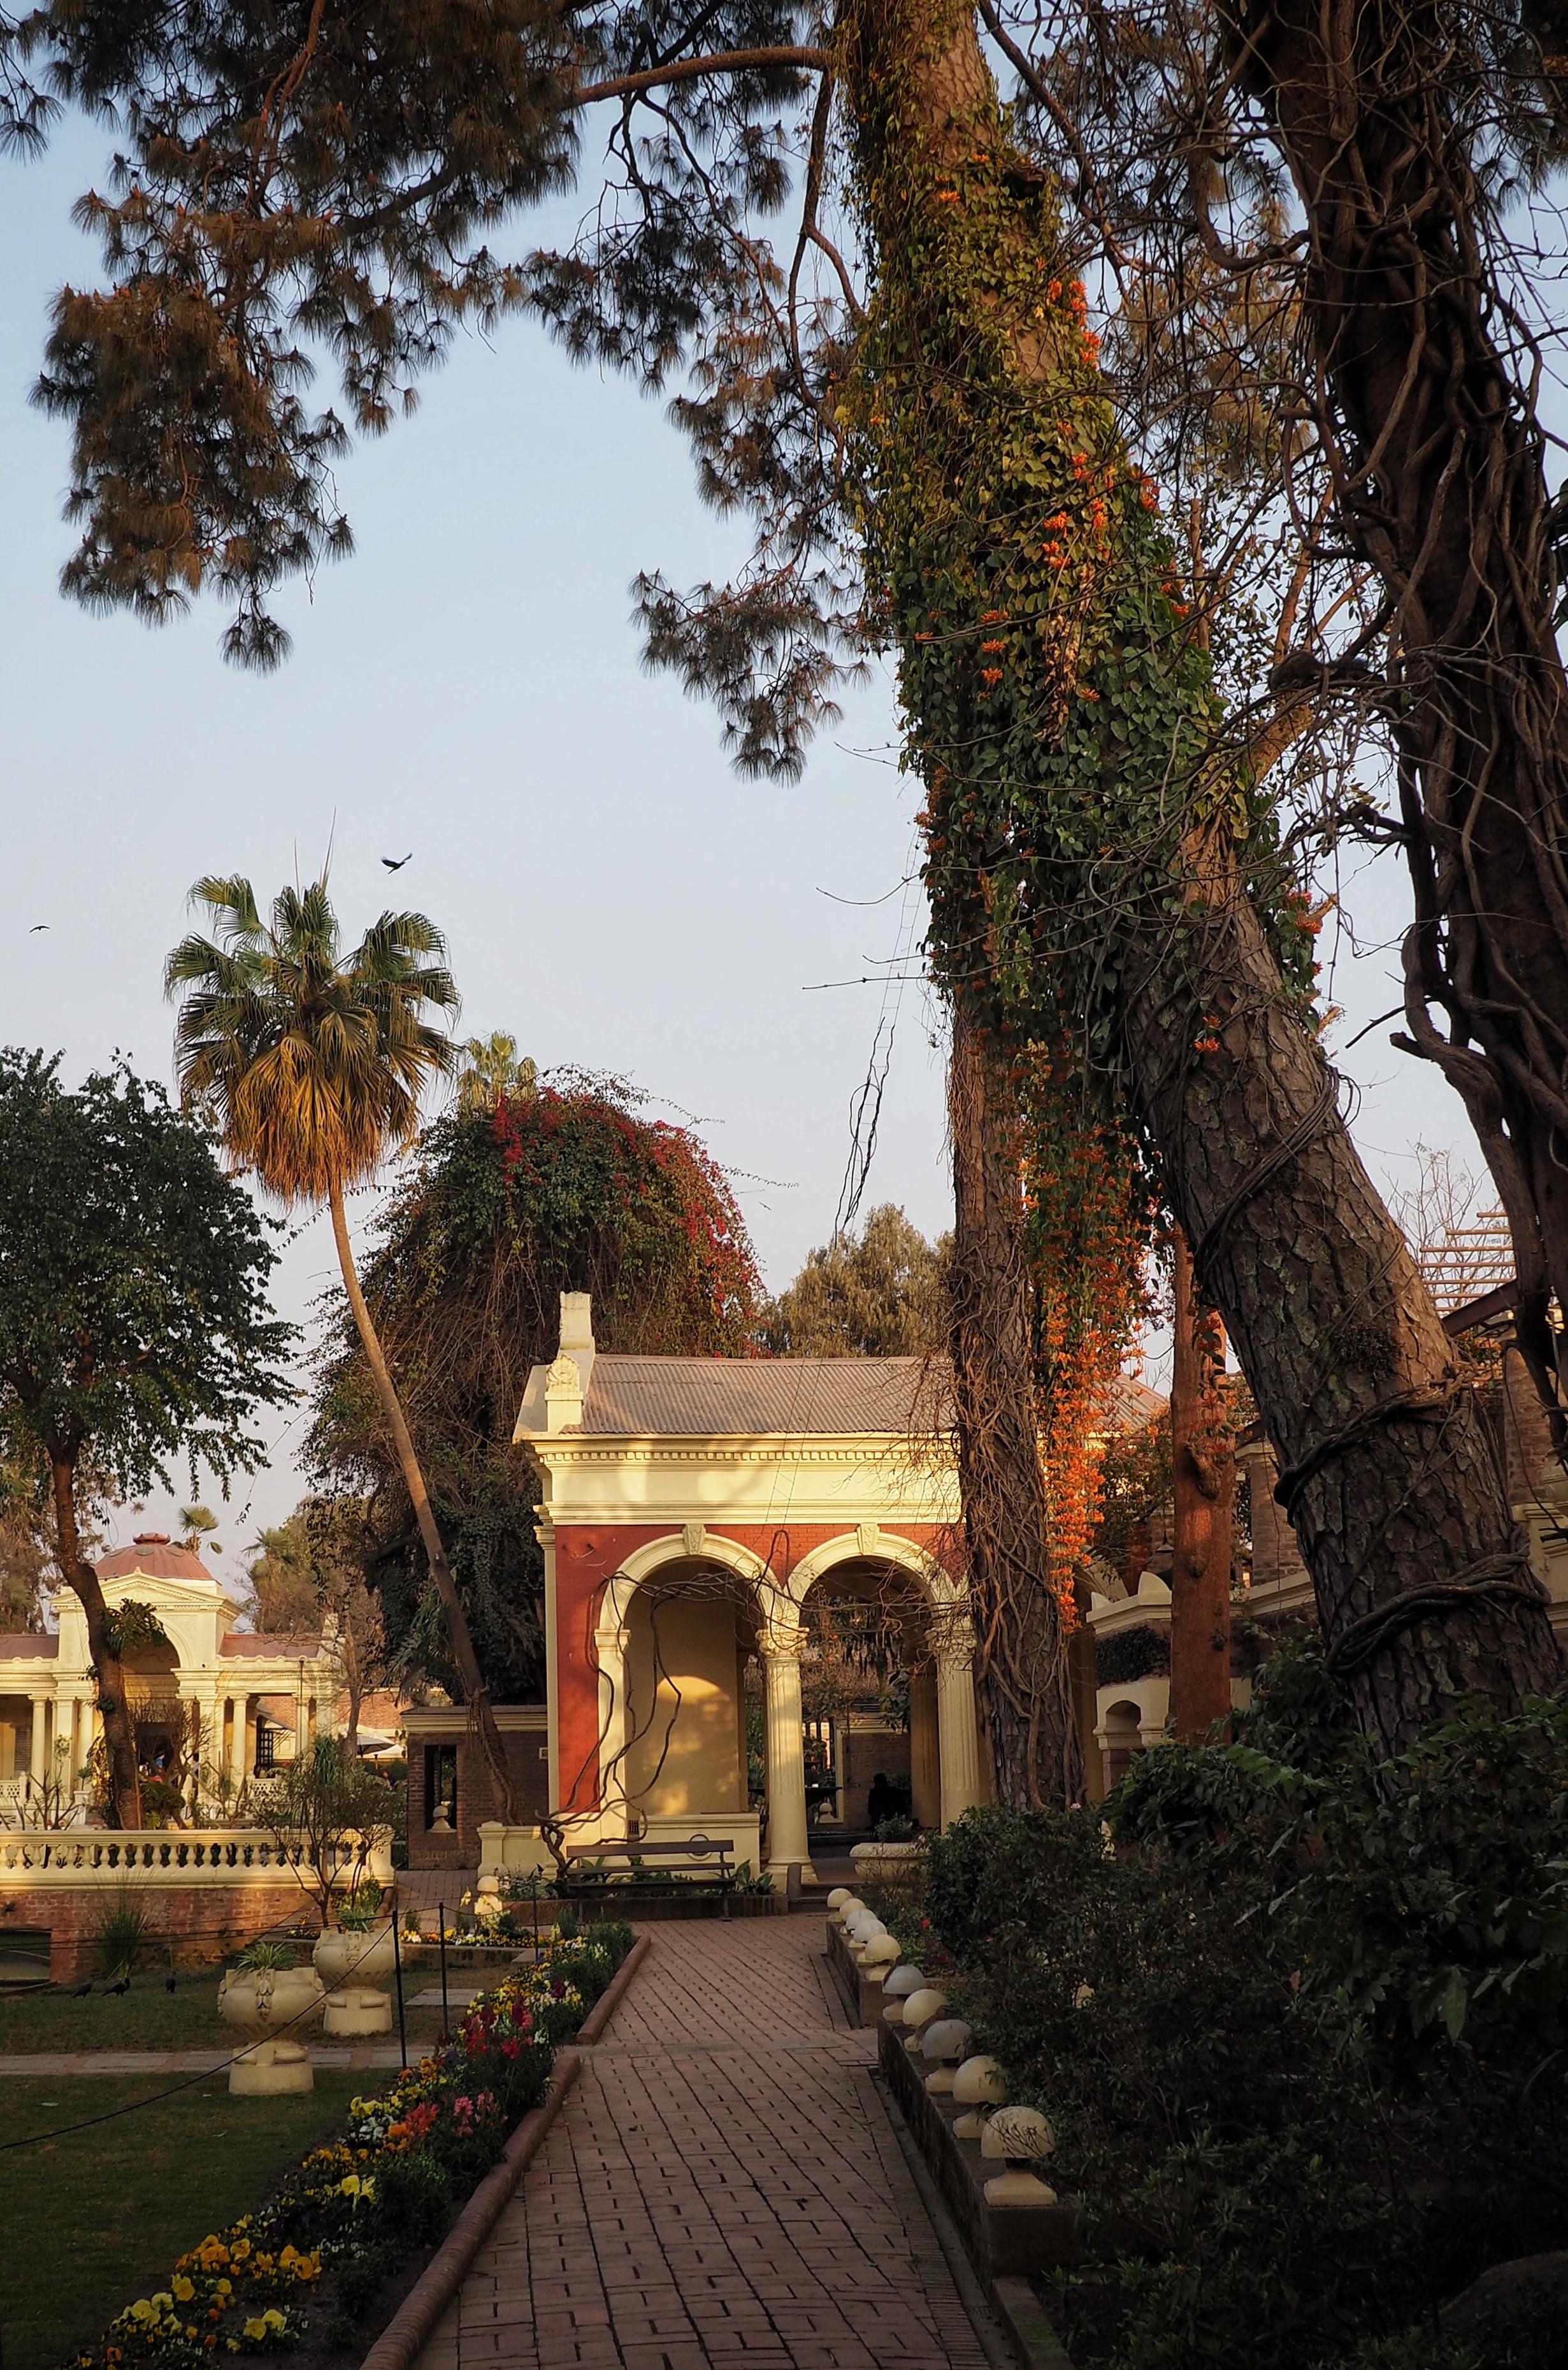 Garden of Dreams, Kathmandu, Plants